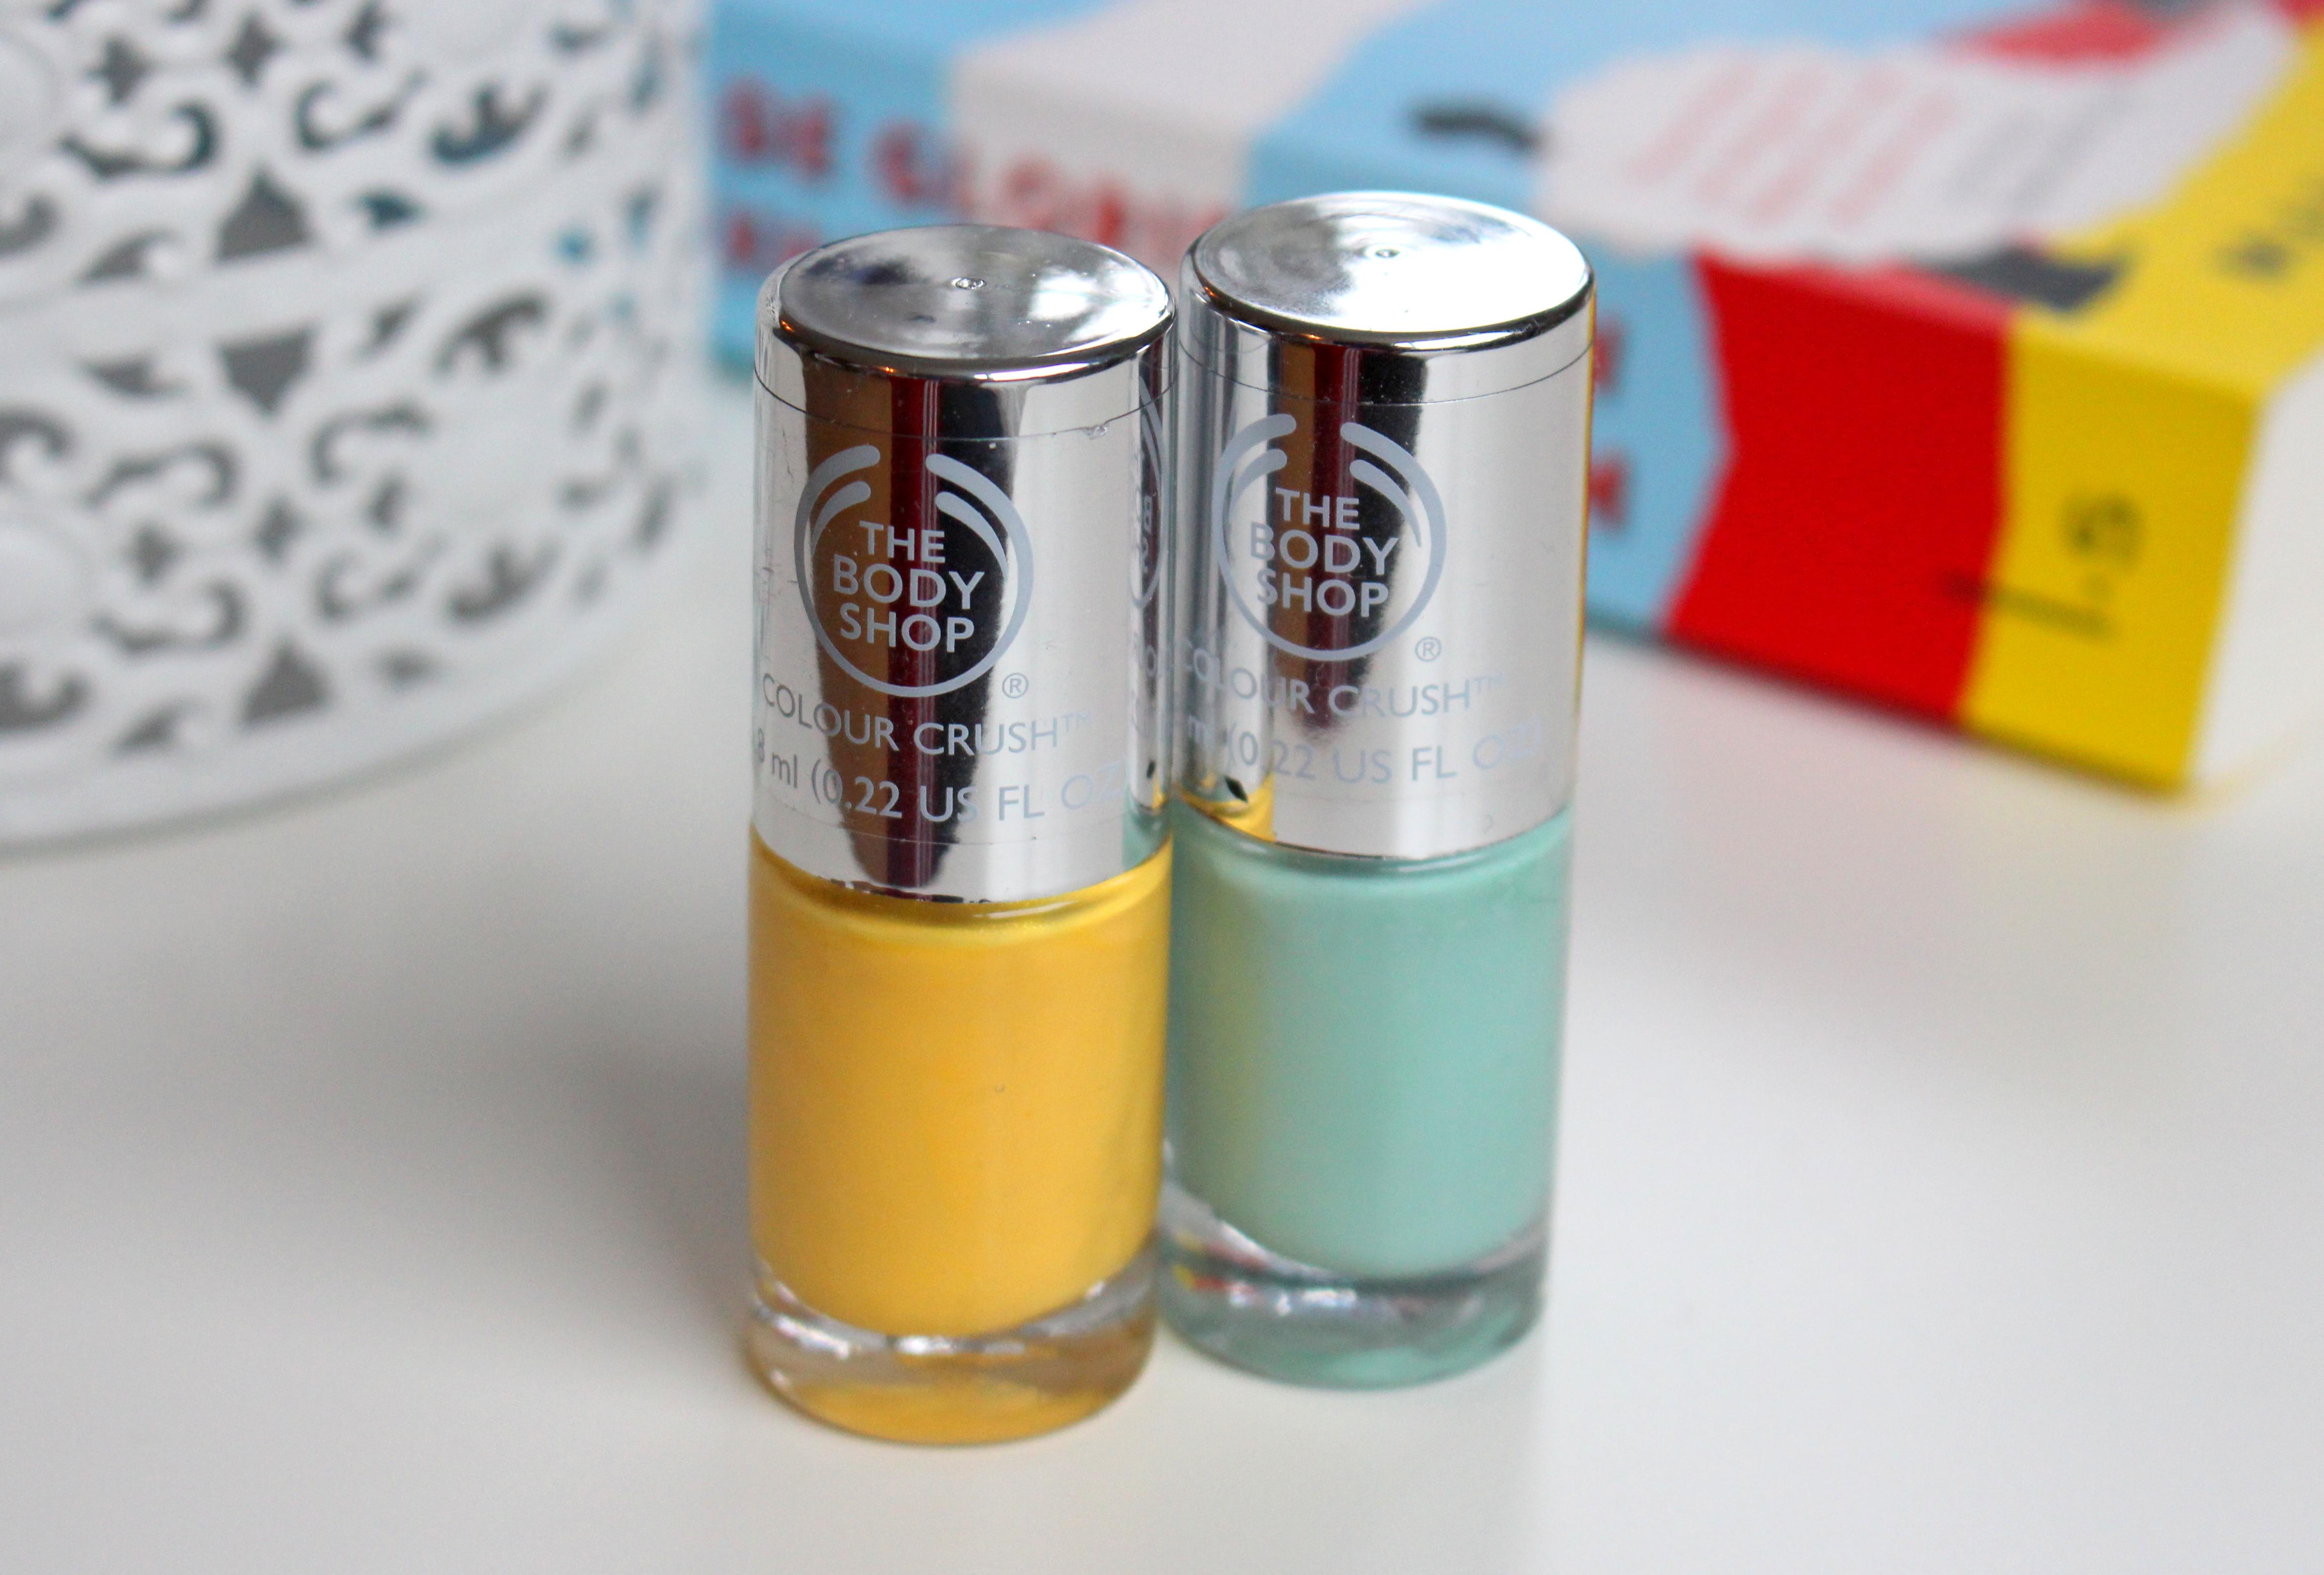 Nieuwe liefdes: Mint Cream & A Sunny Affair nagellak